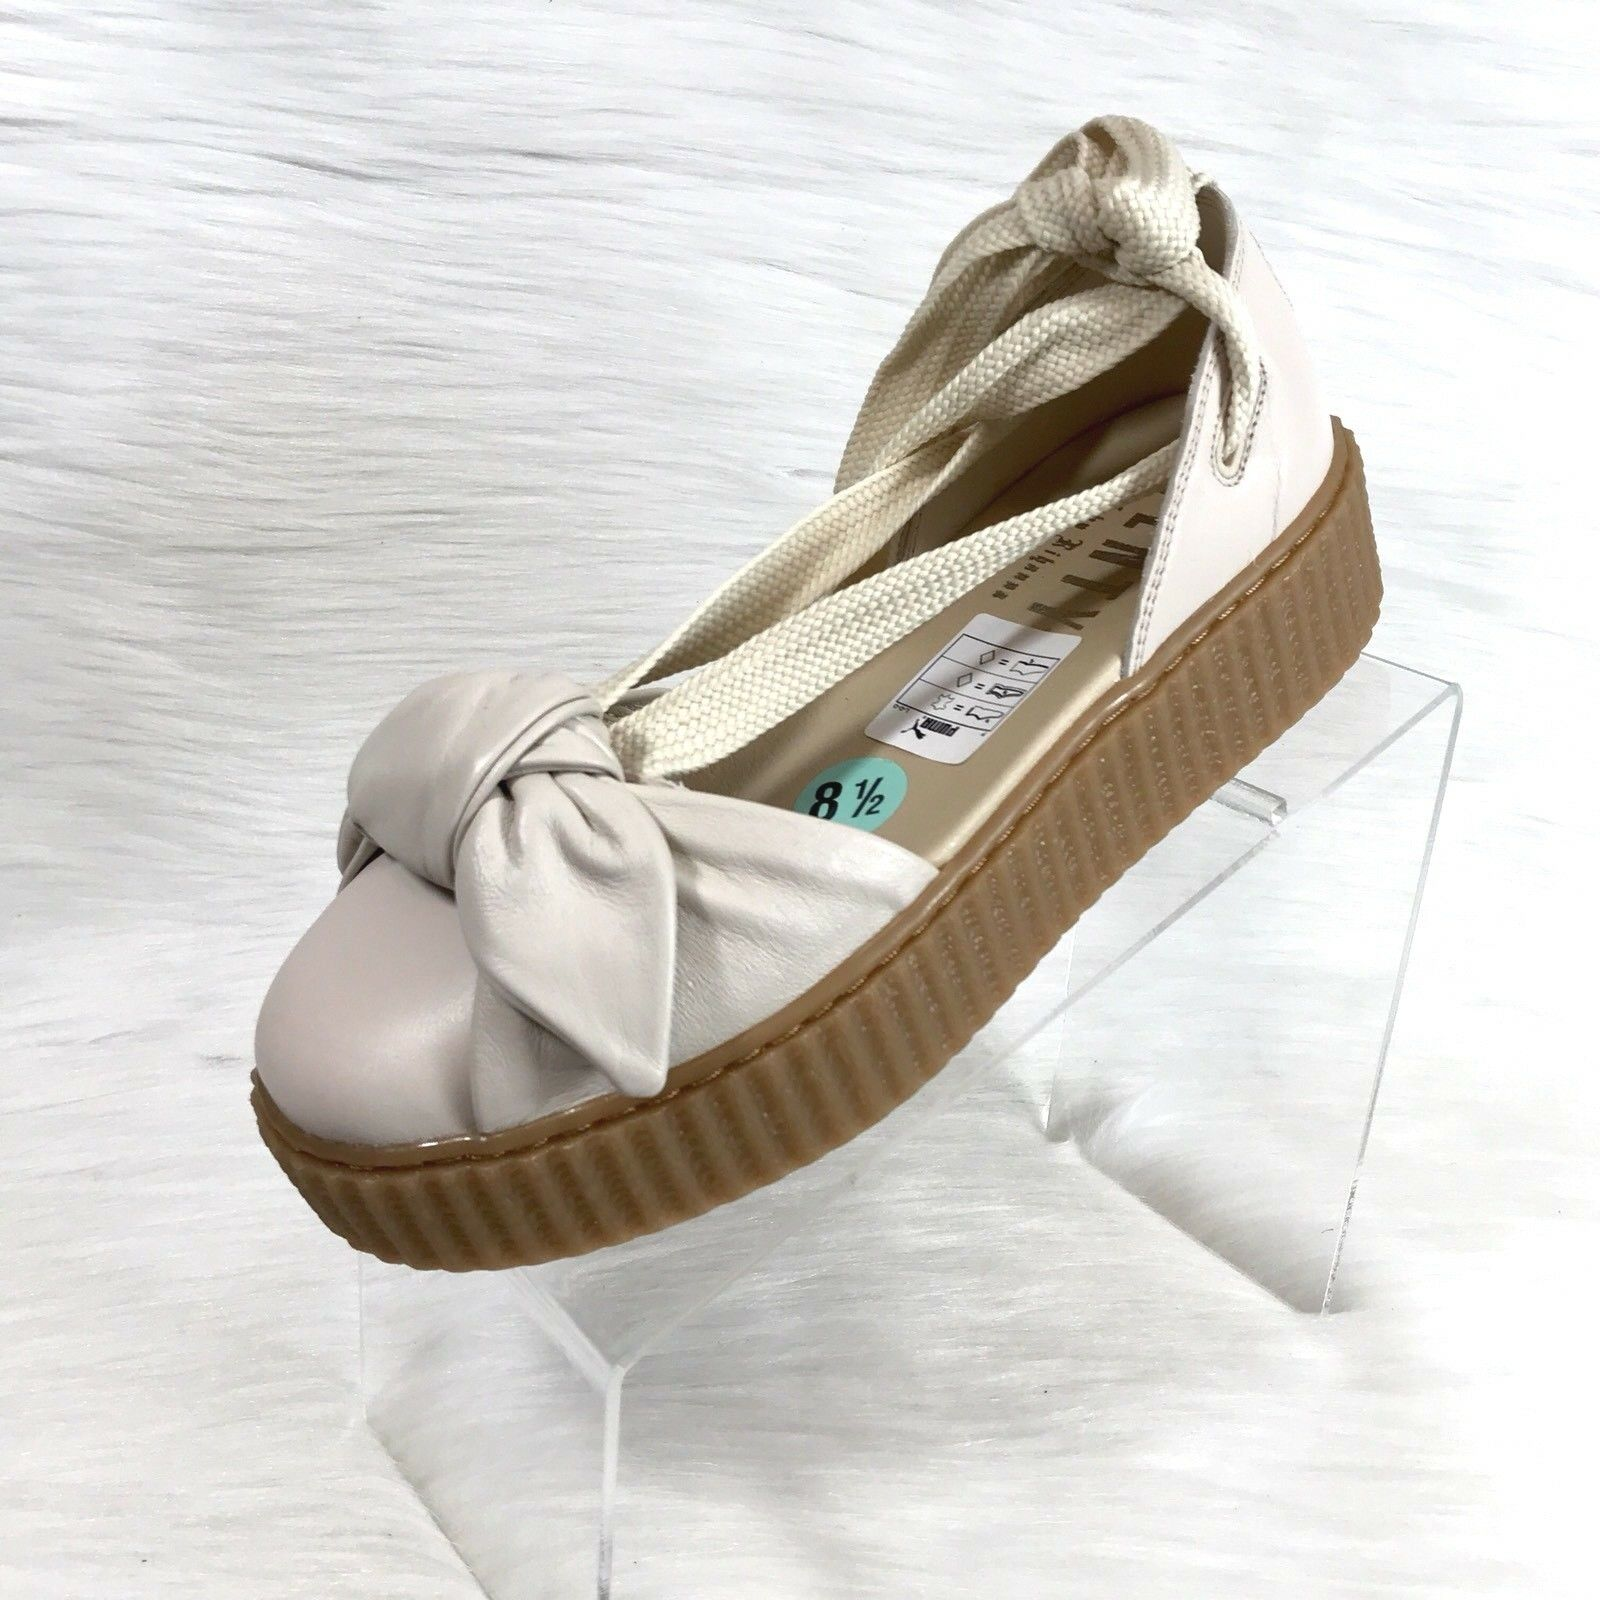 Fenty Puma X  Rihanna Bow Creeper Sandals Beige Leather Size 8.5 New